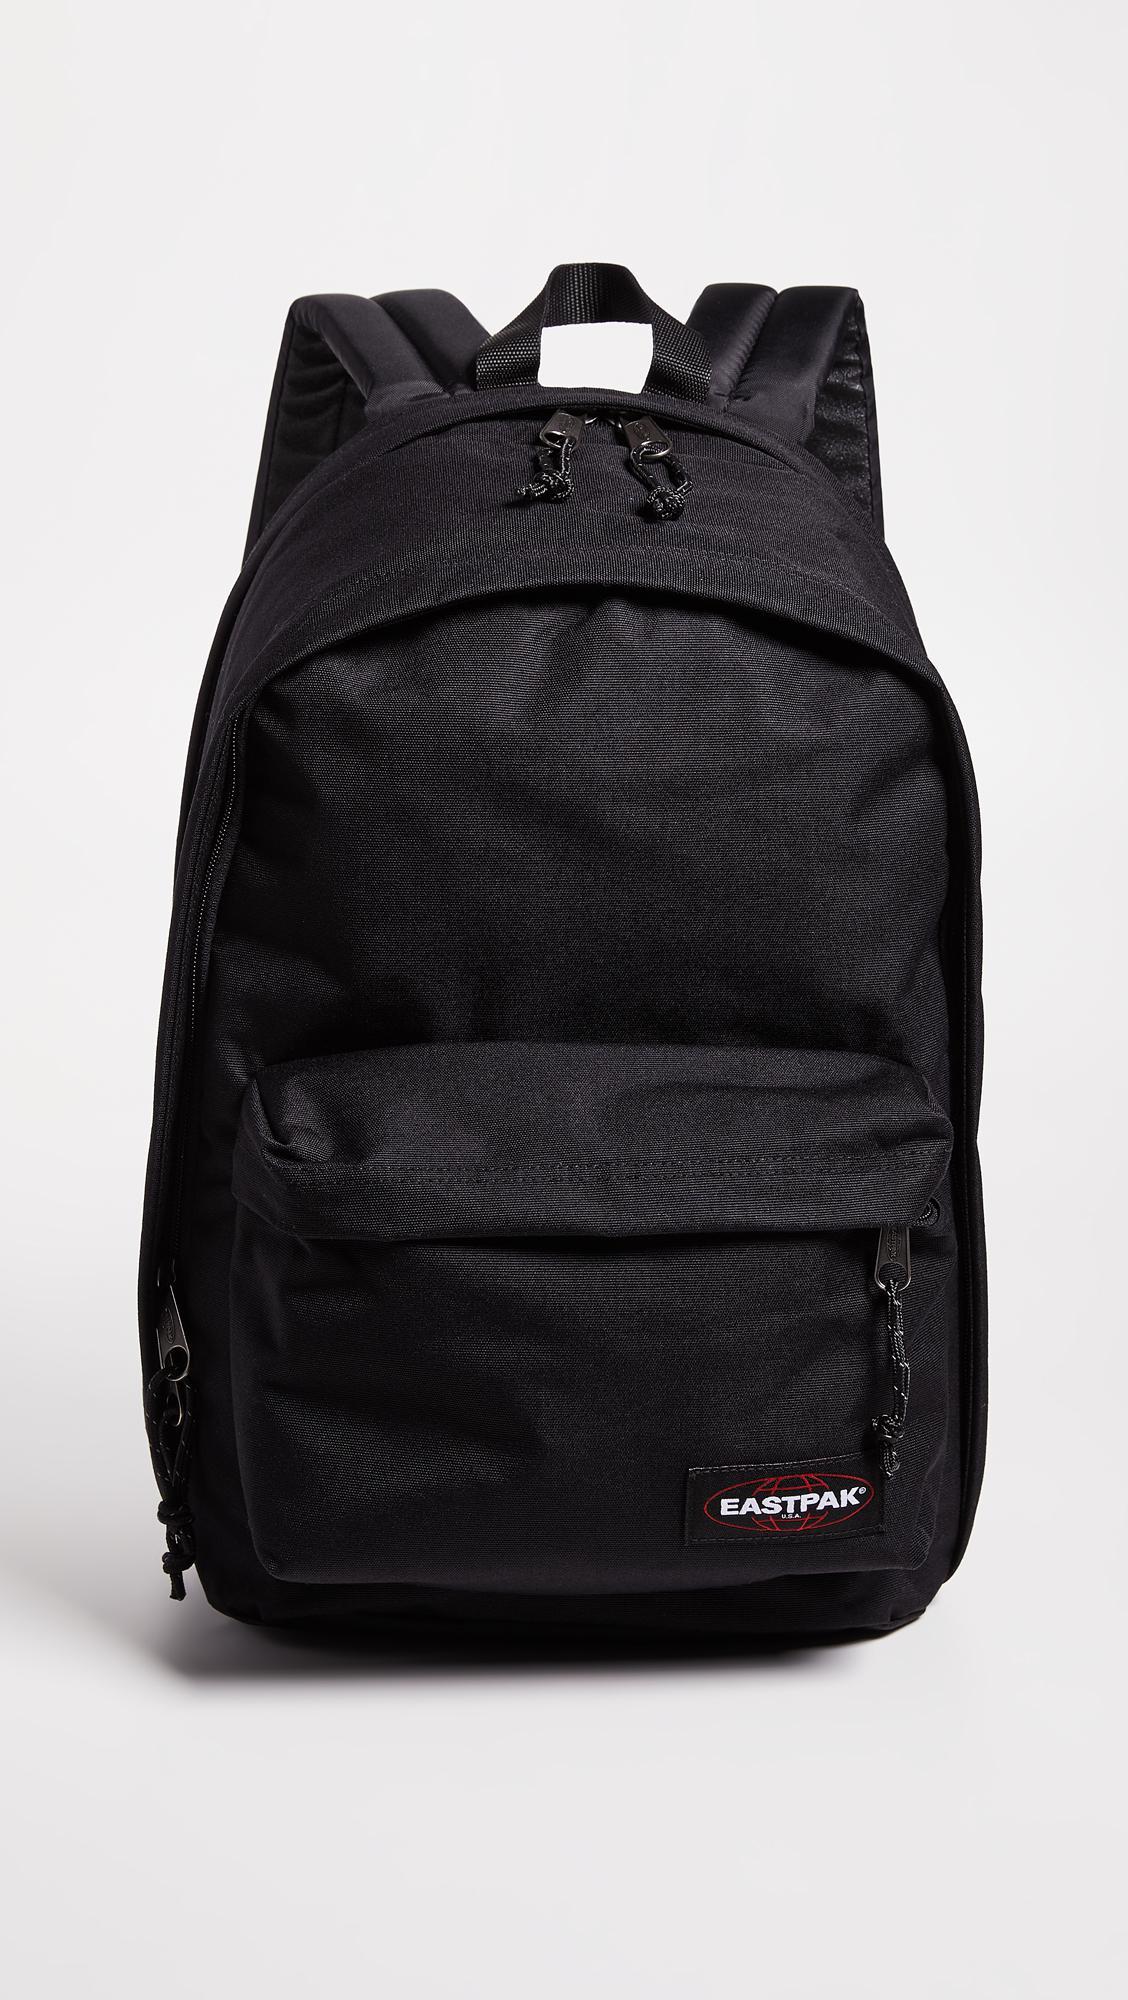 2281cef1d7885 Eastpak - Black Back To Work Backpack - Lyst. View fullscreen